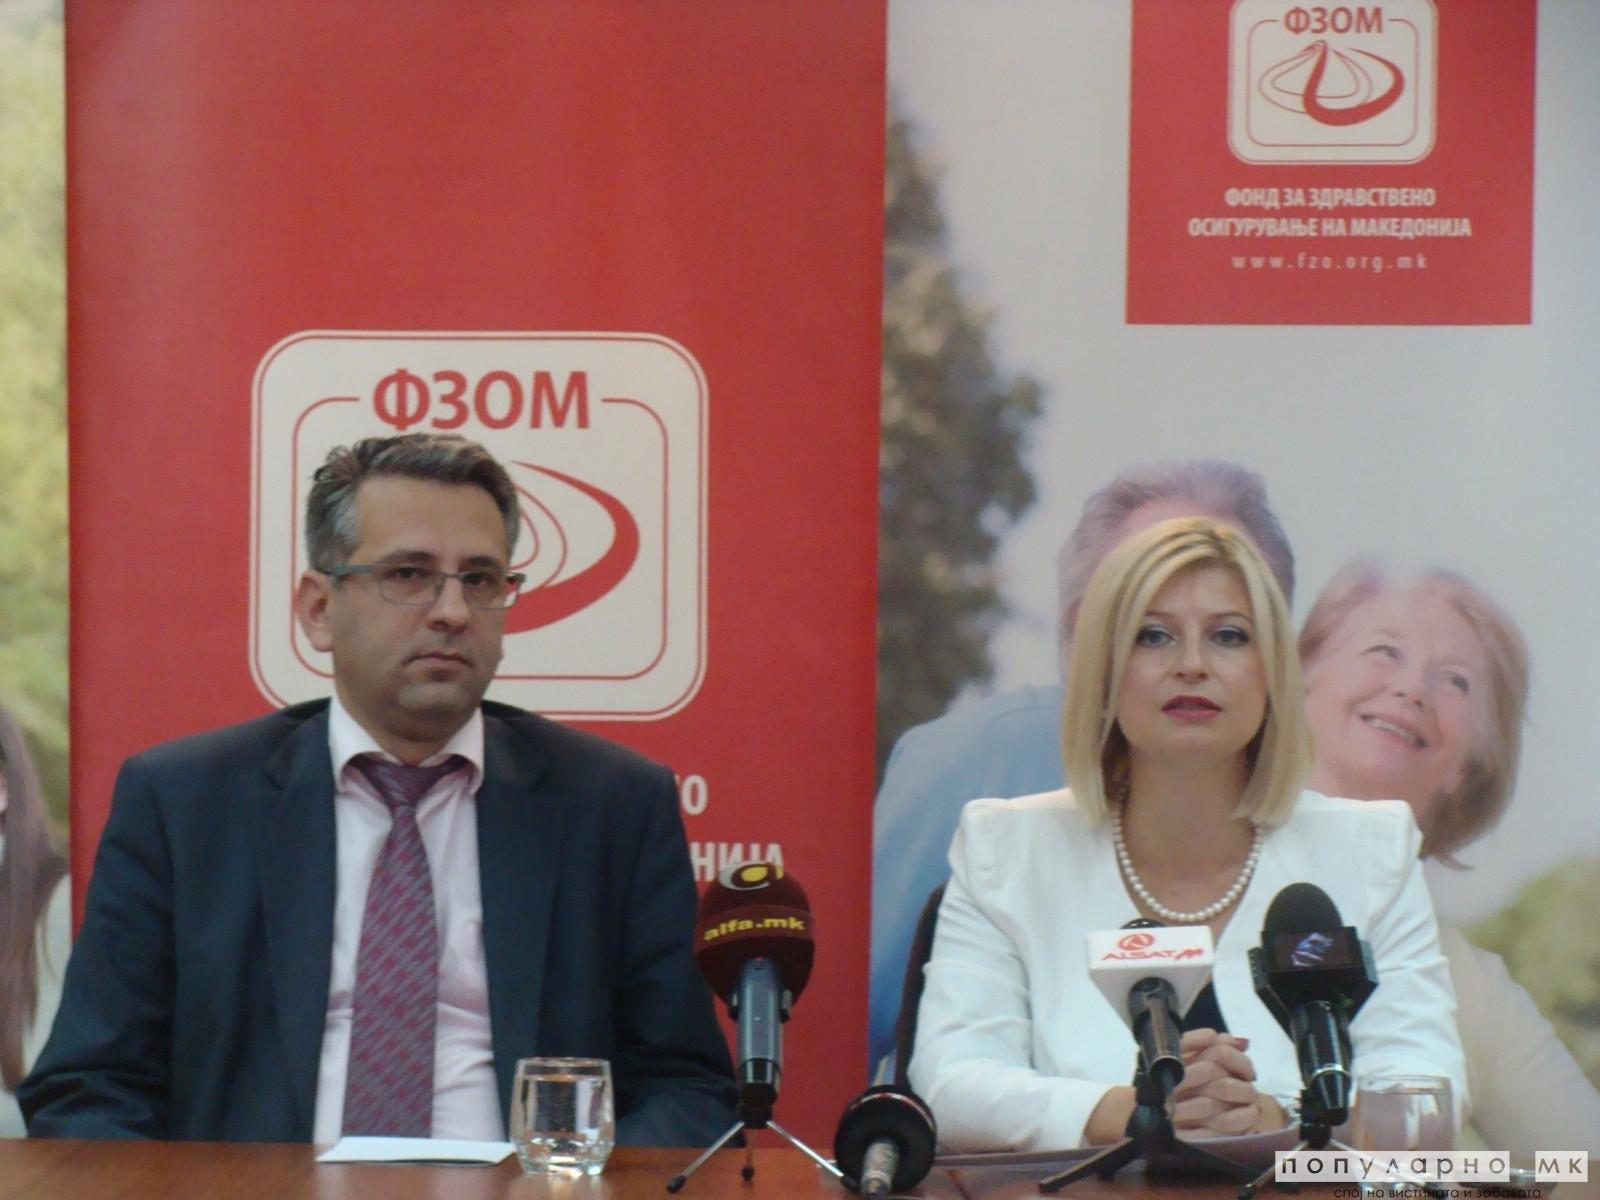 Директорите на ФЗОМ - Маја Парнаџиева Змејкова и Џемали Мехази поднесоа оставки